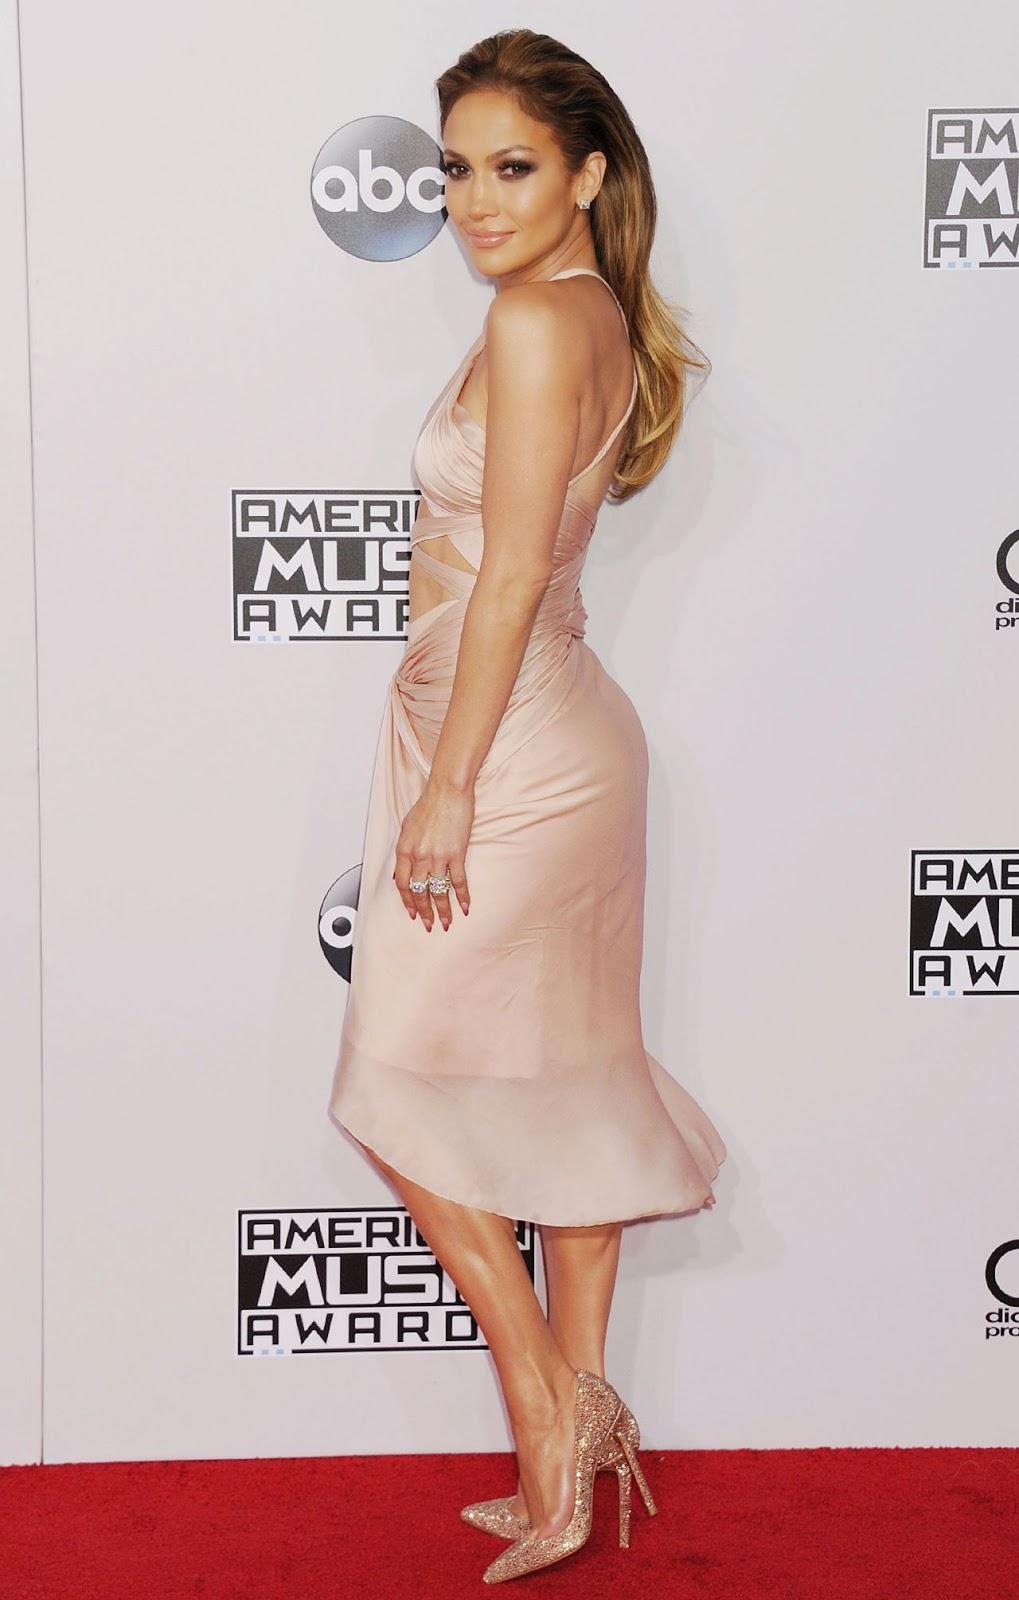 Jennifer Lopez exposes underboob and twerks at American